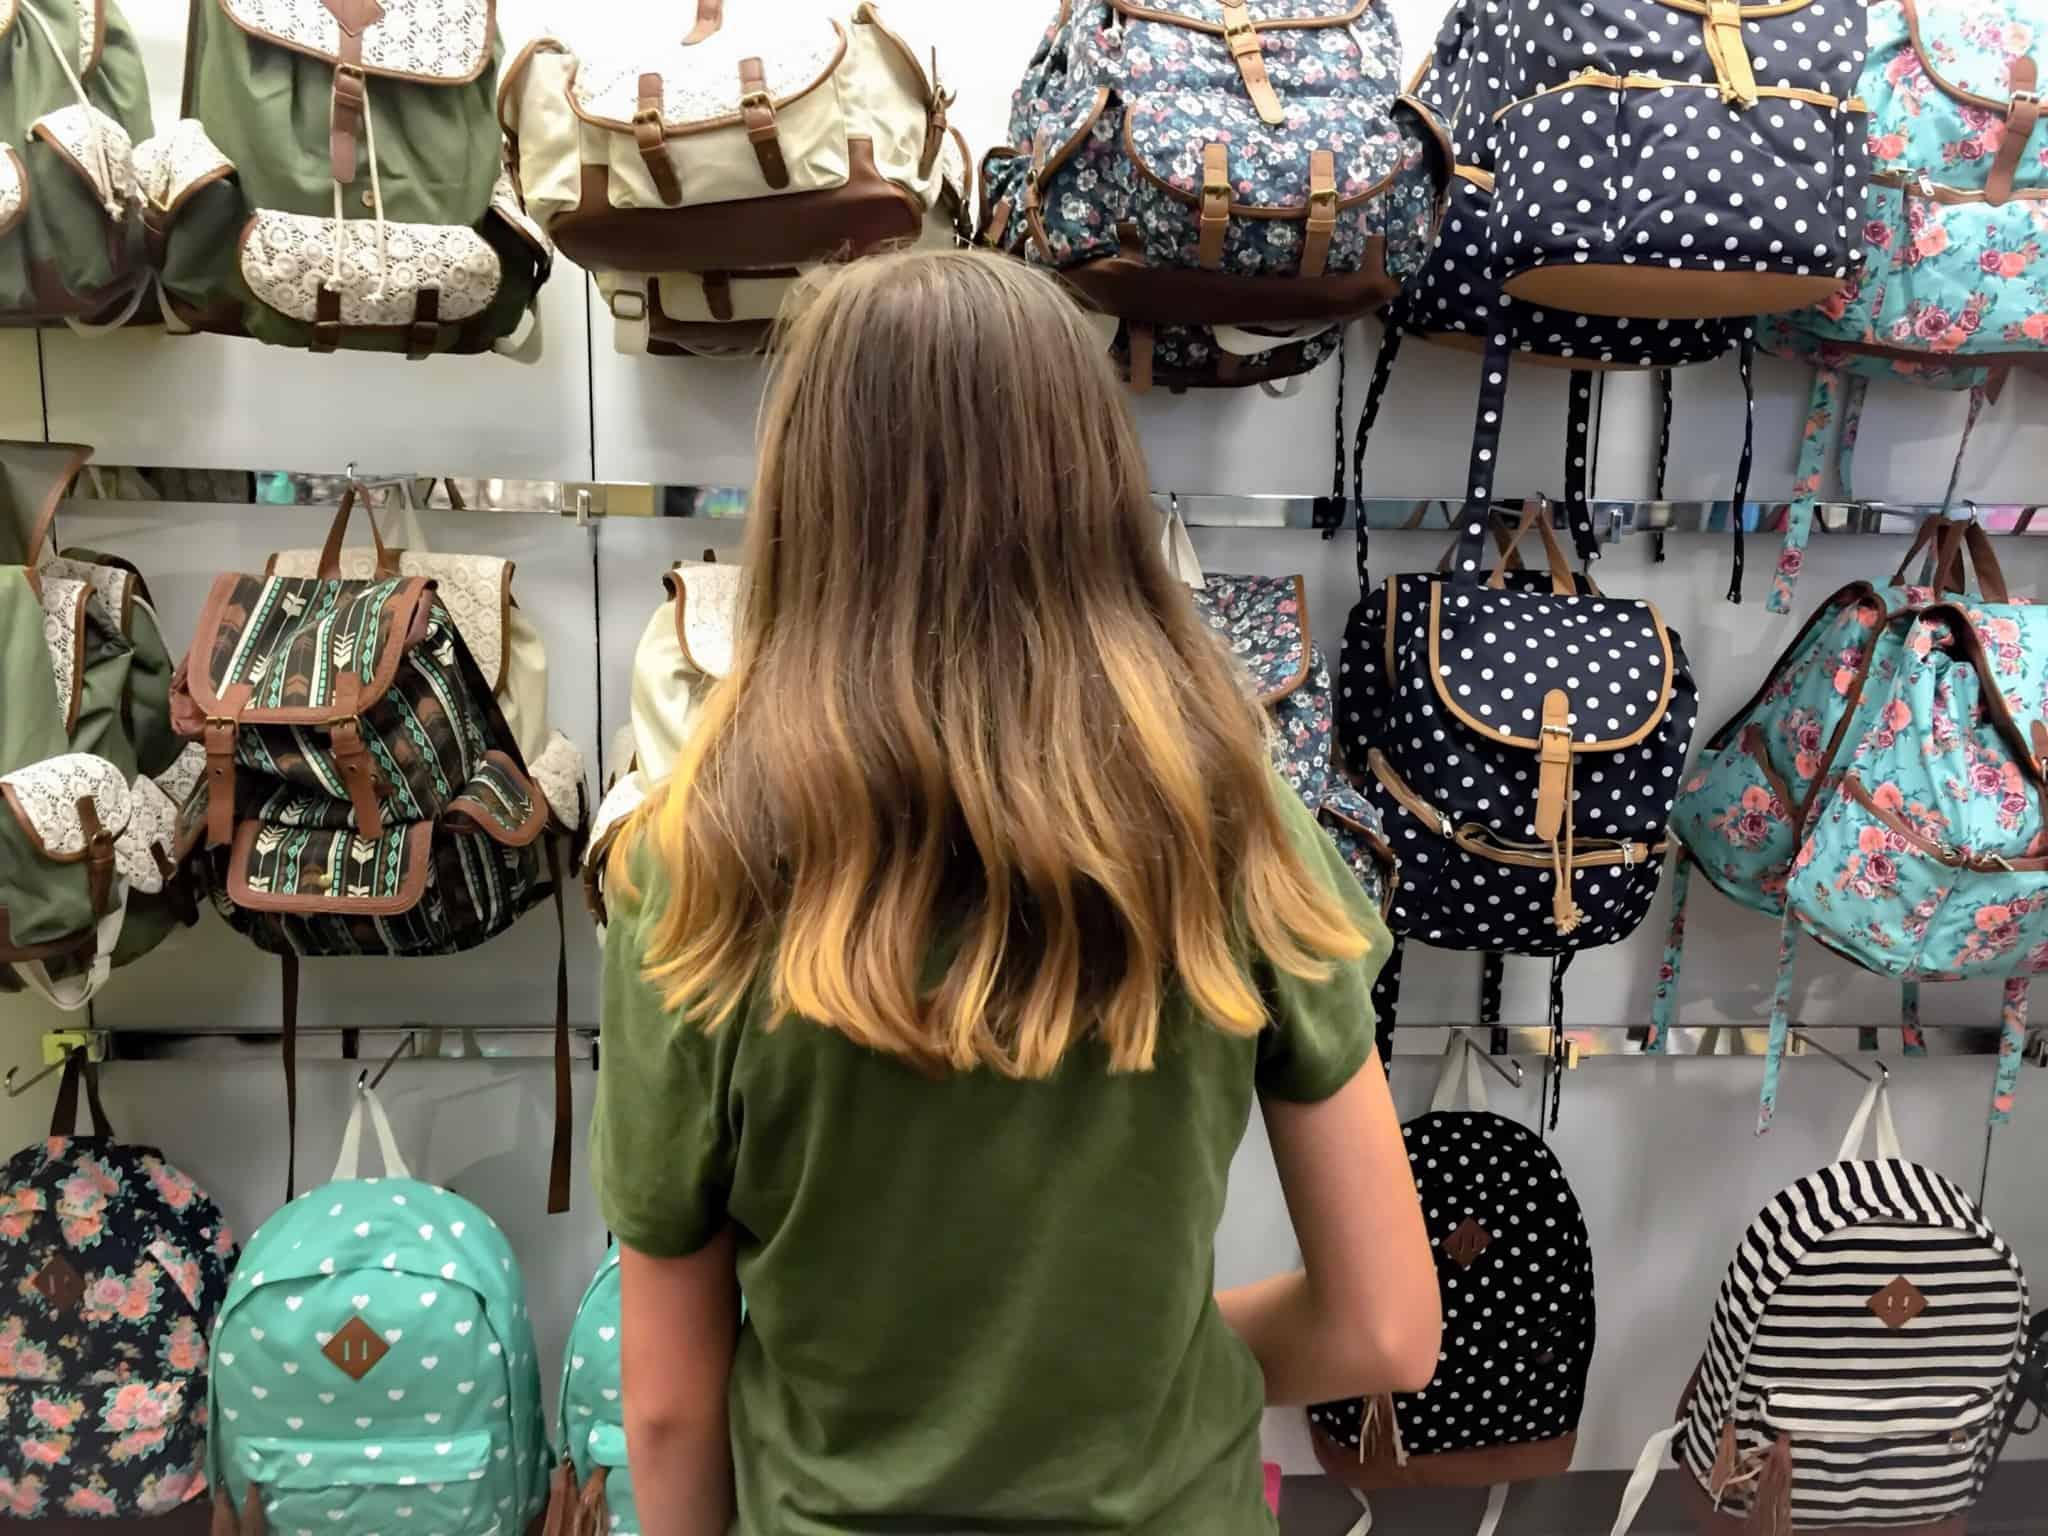 rapariga adolescente a ver malas numa loja